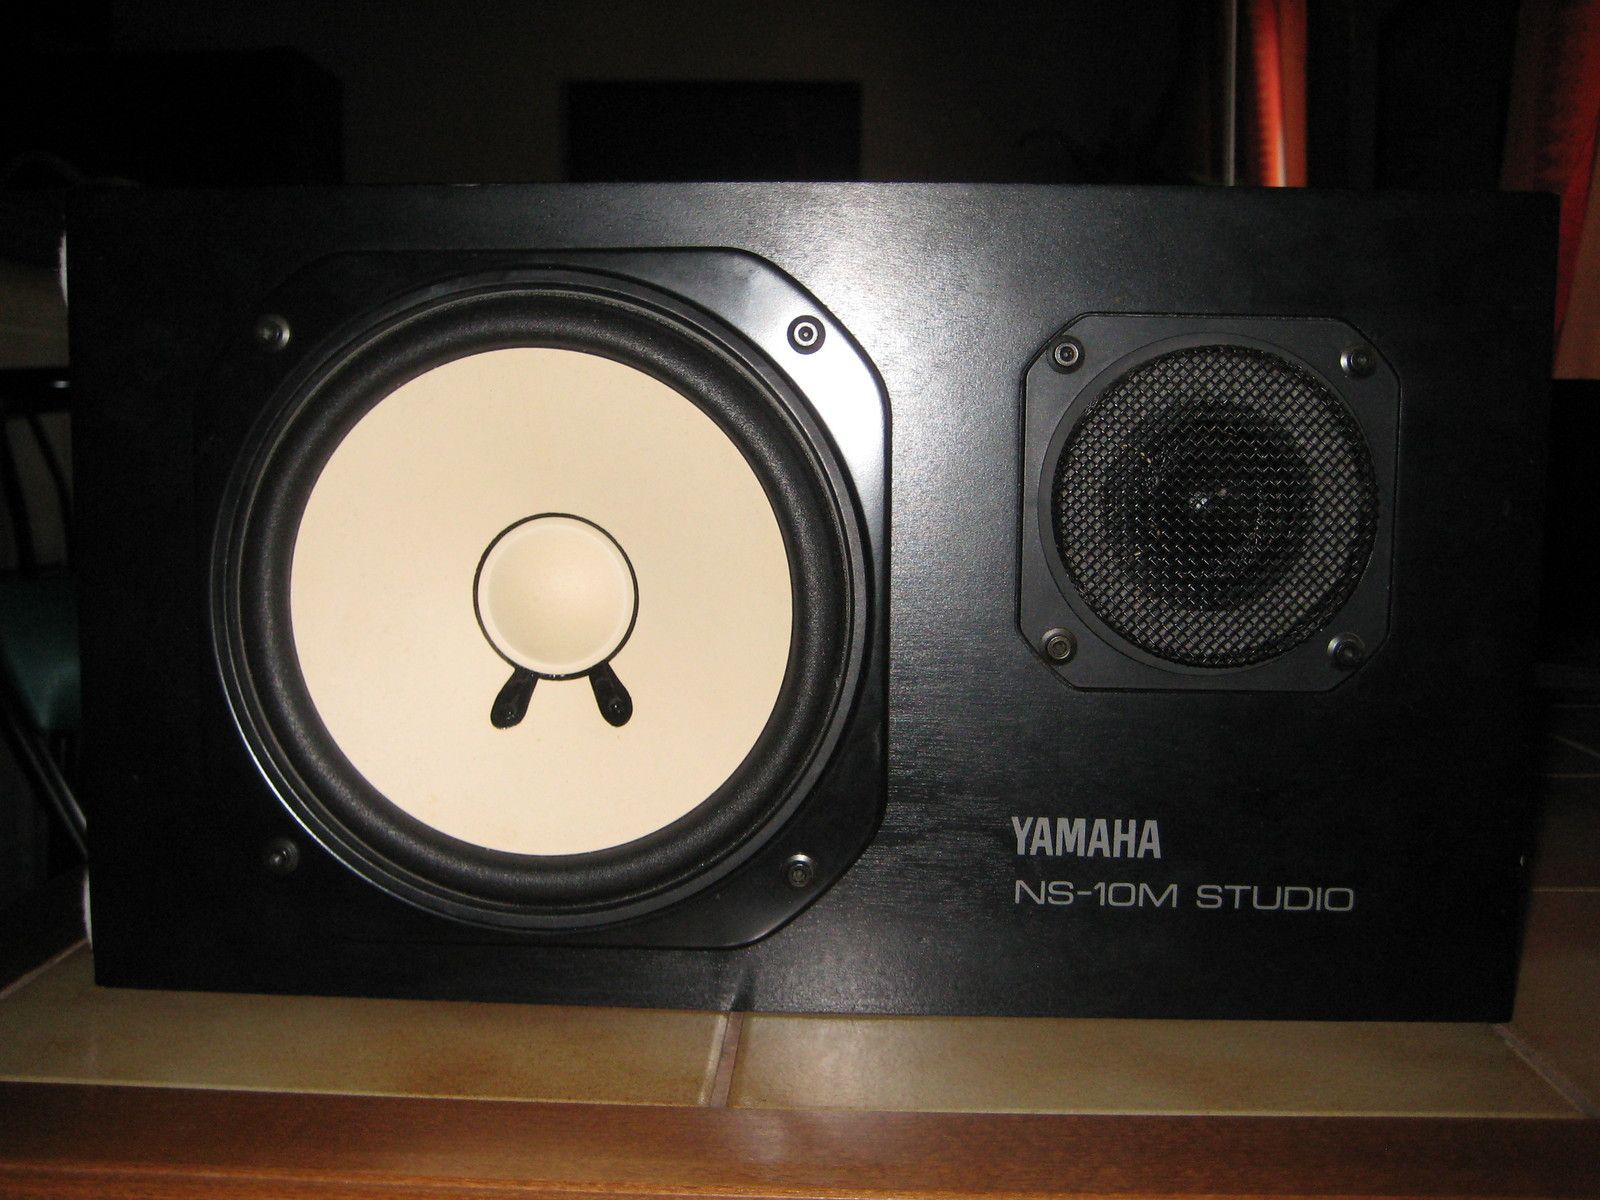 yamaha ns 10m studio image 219482 audiofanzine. Black Bedroom Furniture Sets. Home Design Ideas